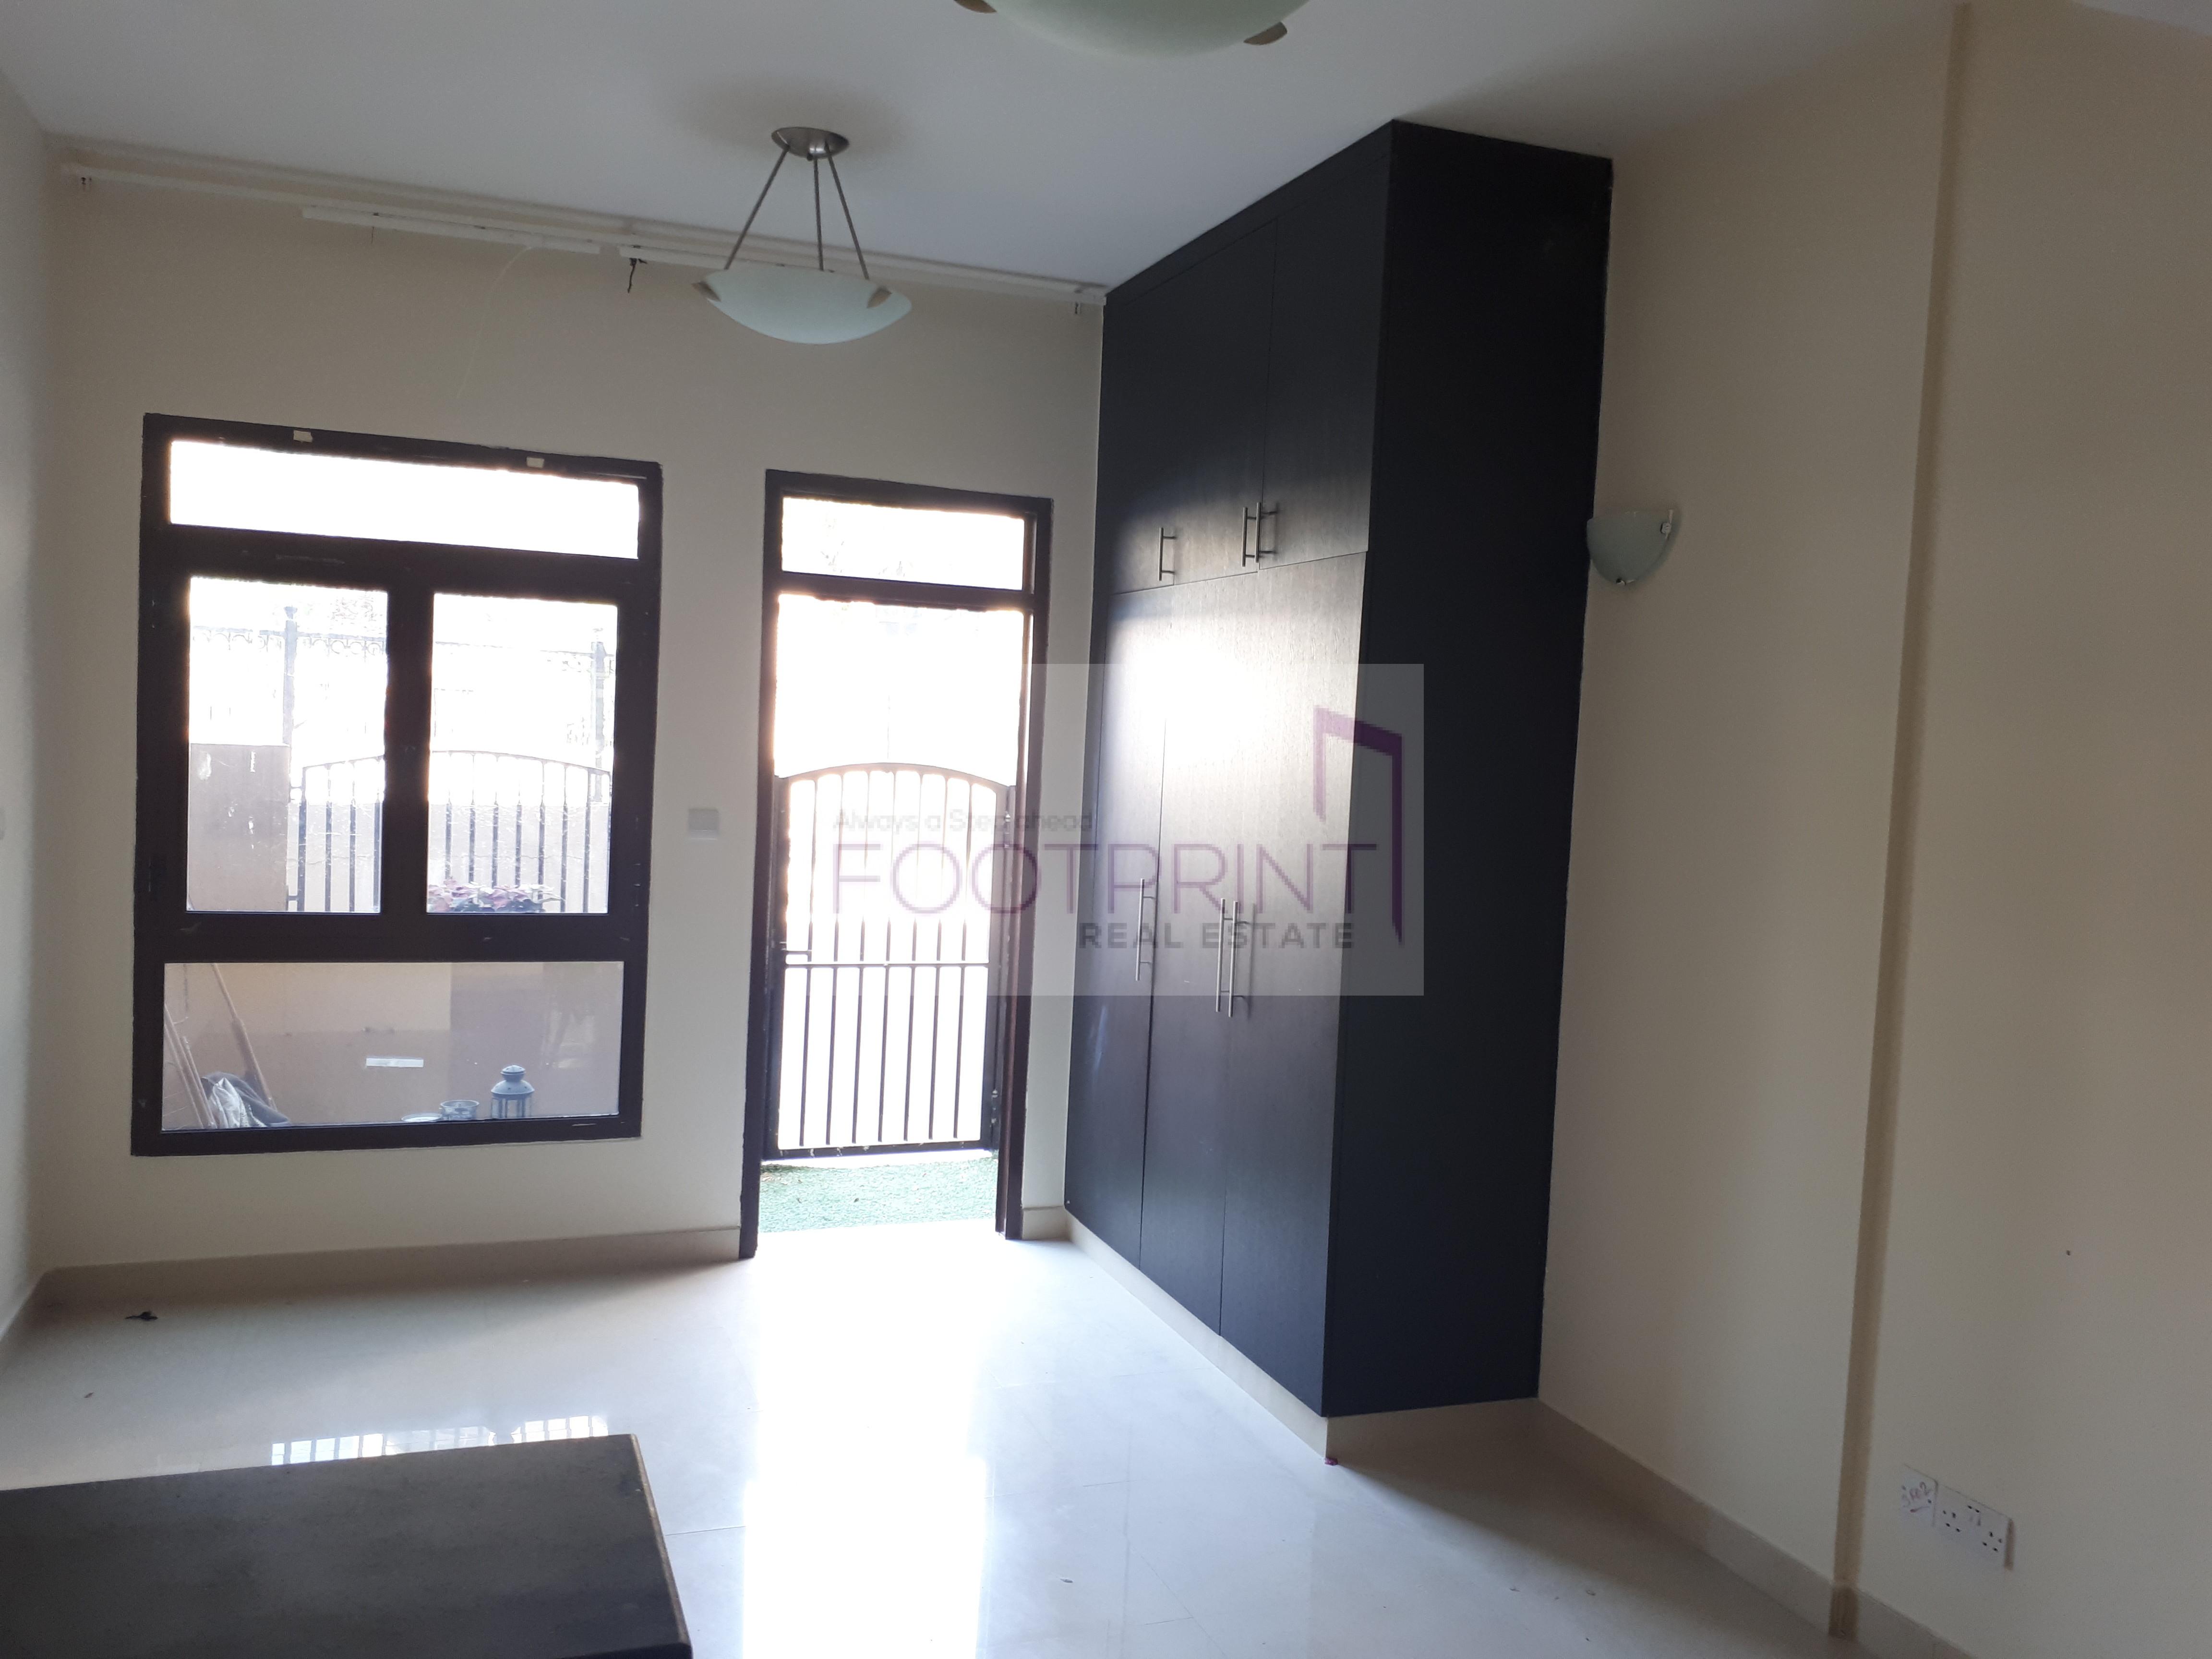 |Best offer| Studio Apartment 2 parking